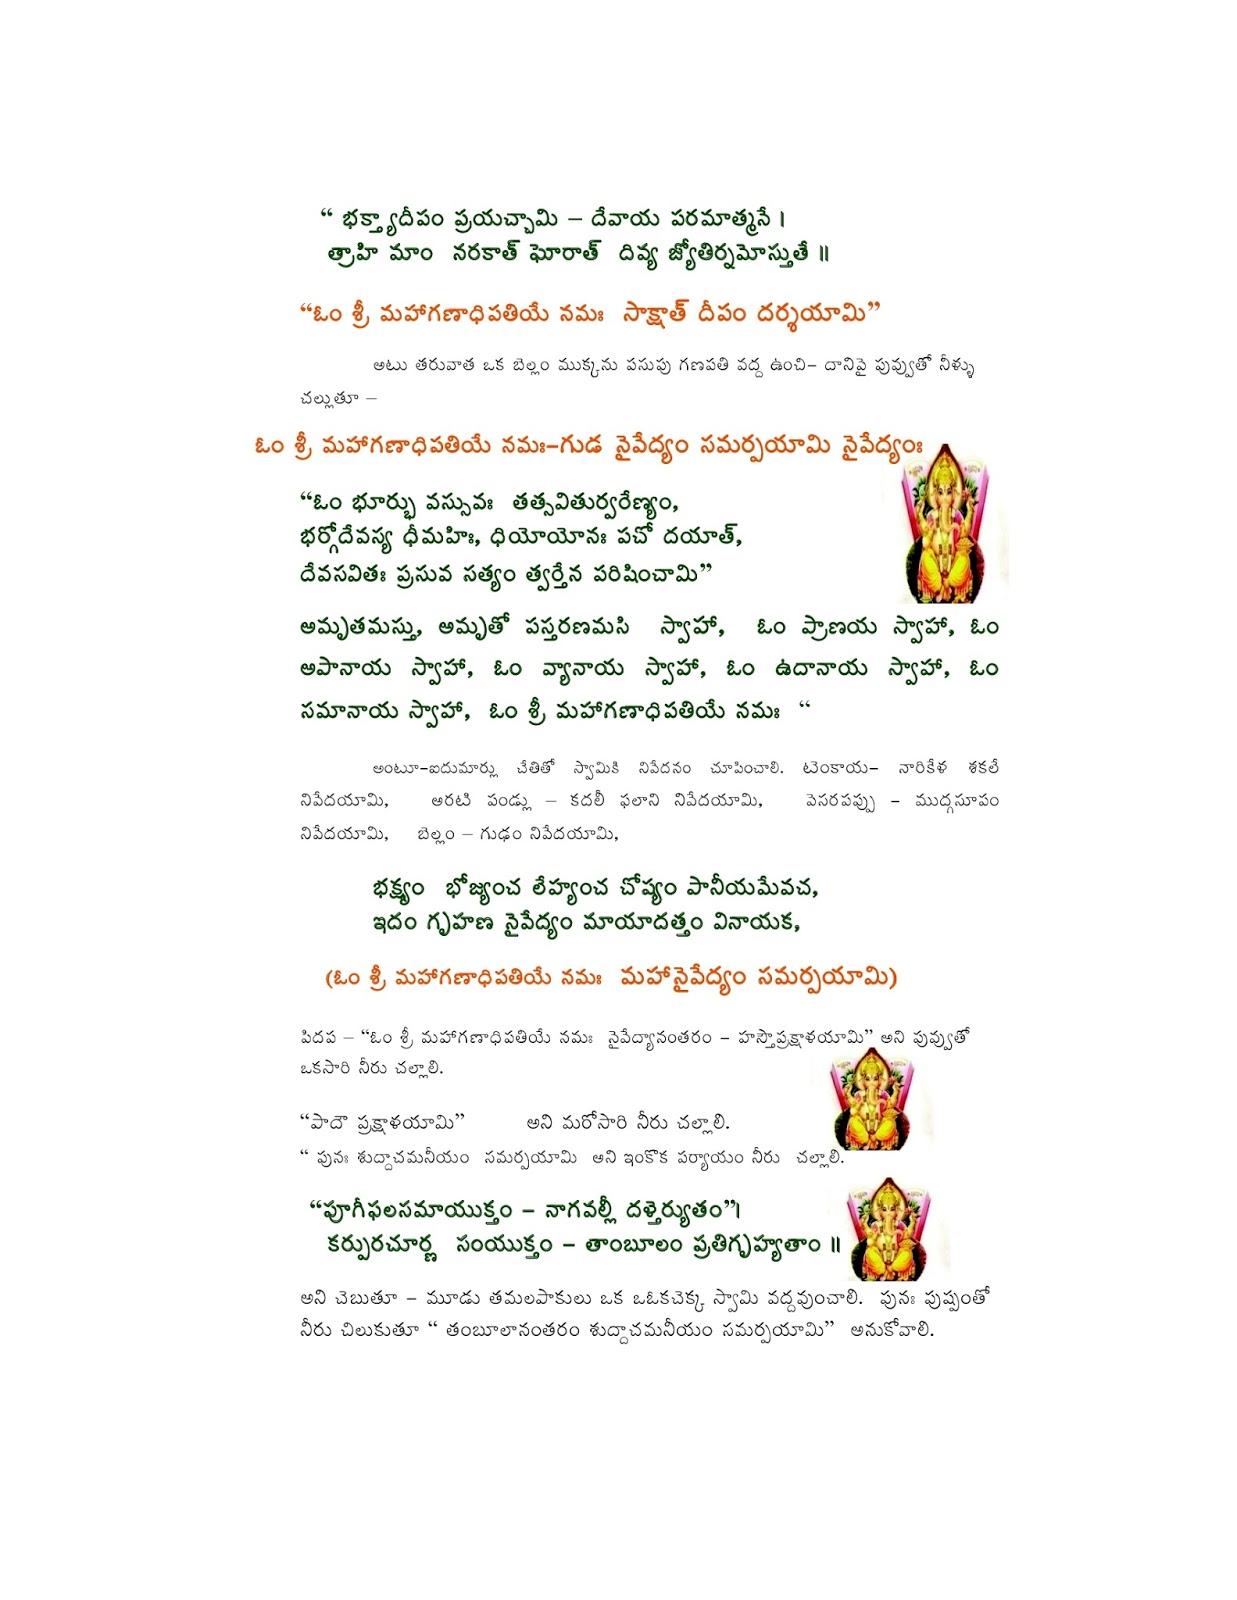 Ayyappa swamy pooja vidhanam in telugu